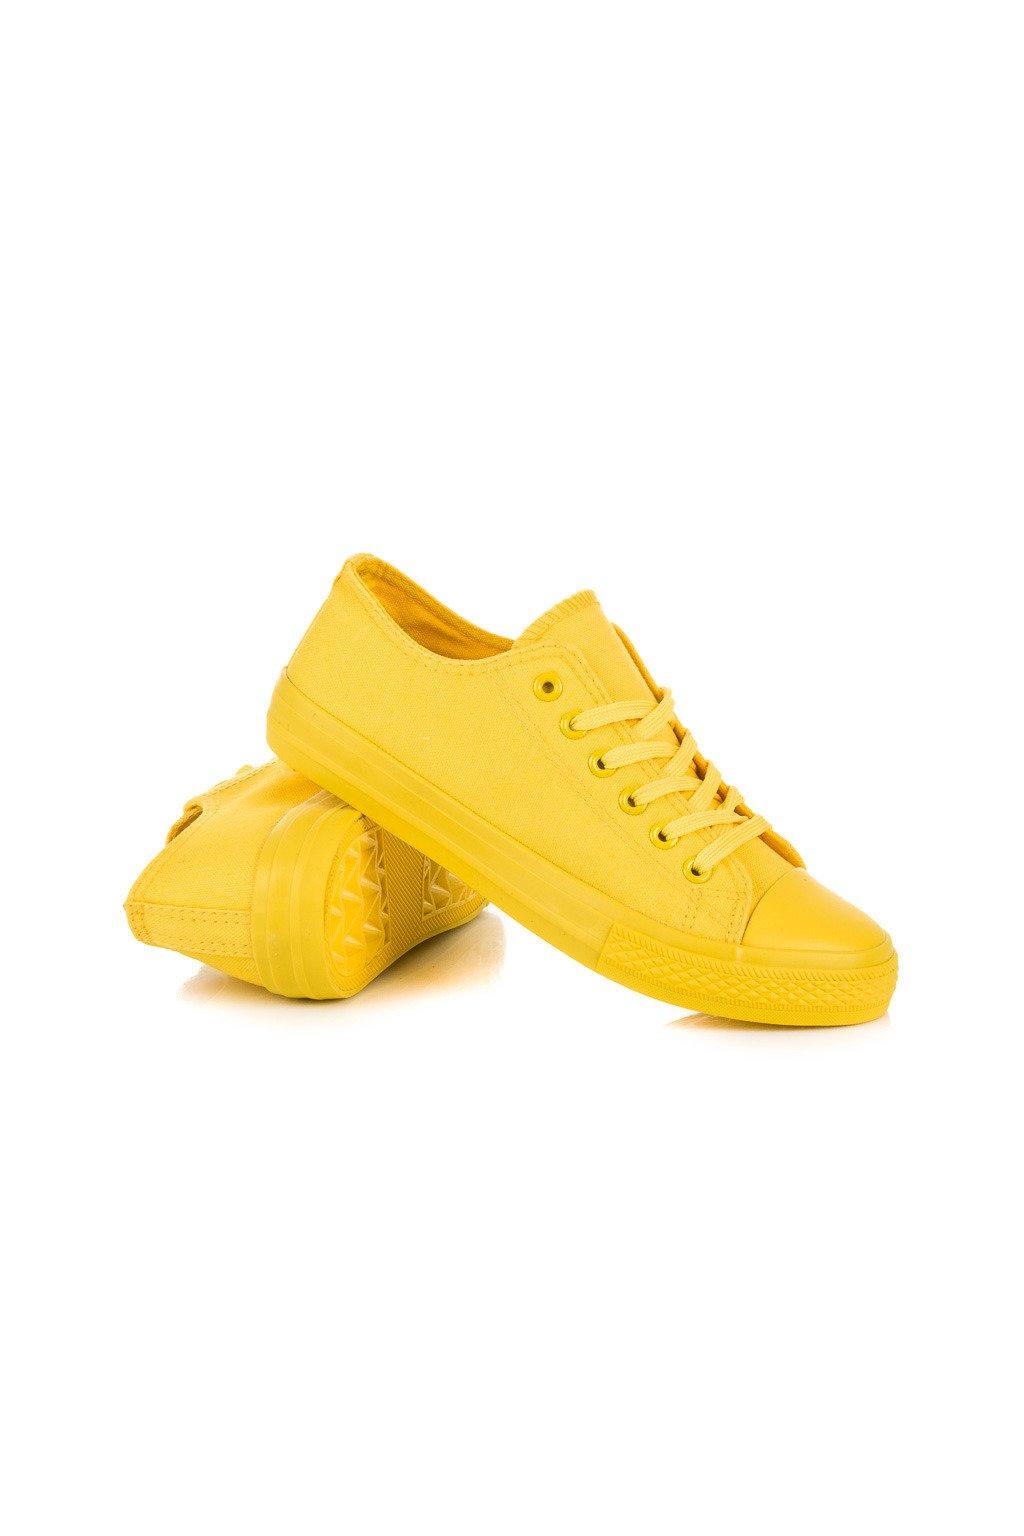 Textilné plátenky žlté Seastar NB176Y 4a6a13c8928